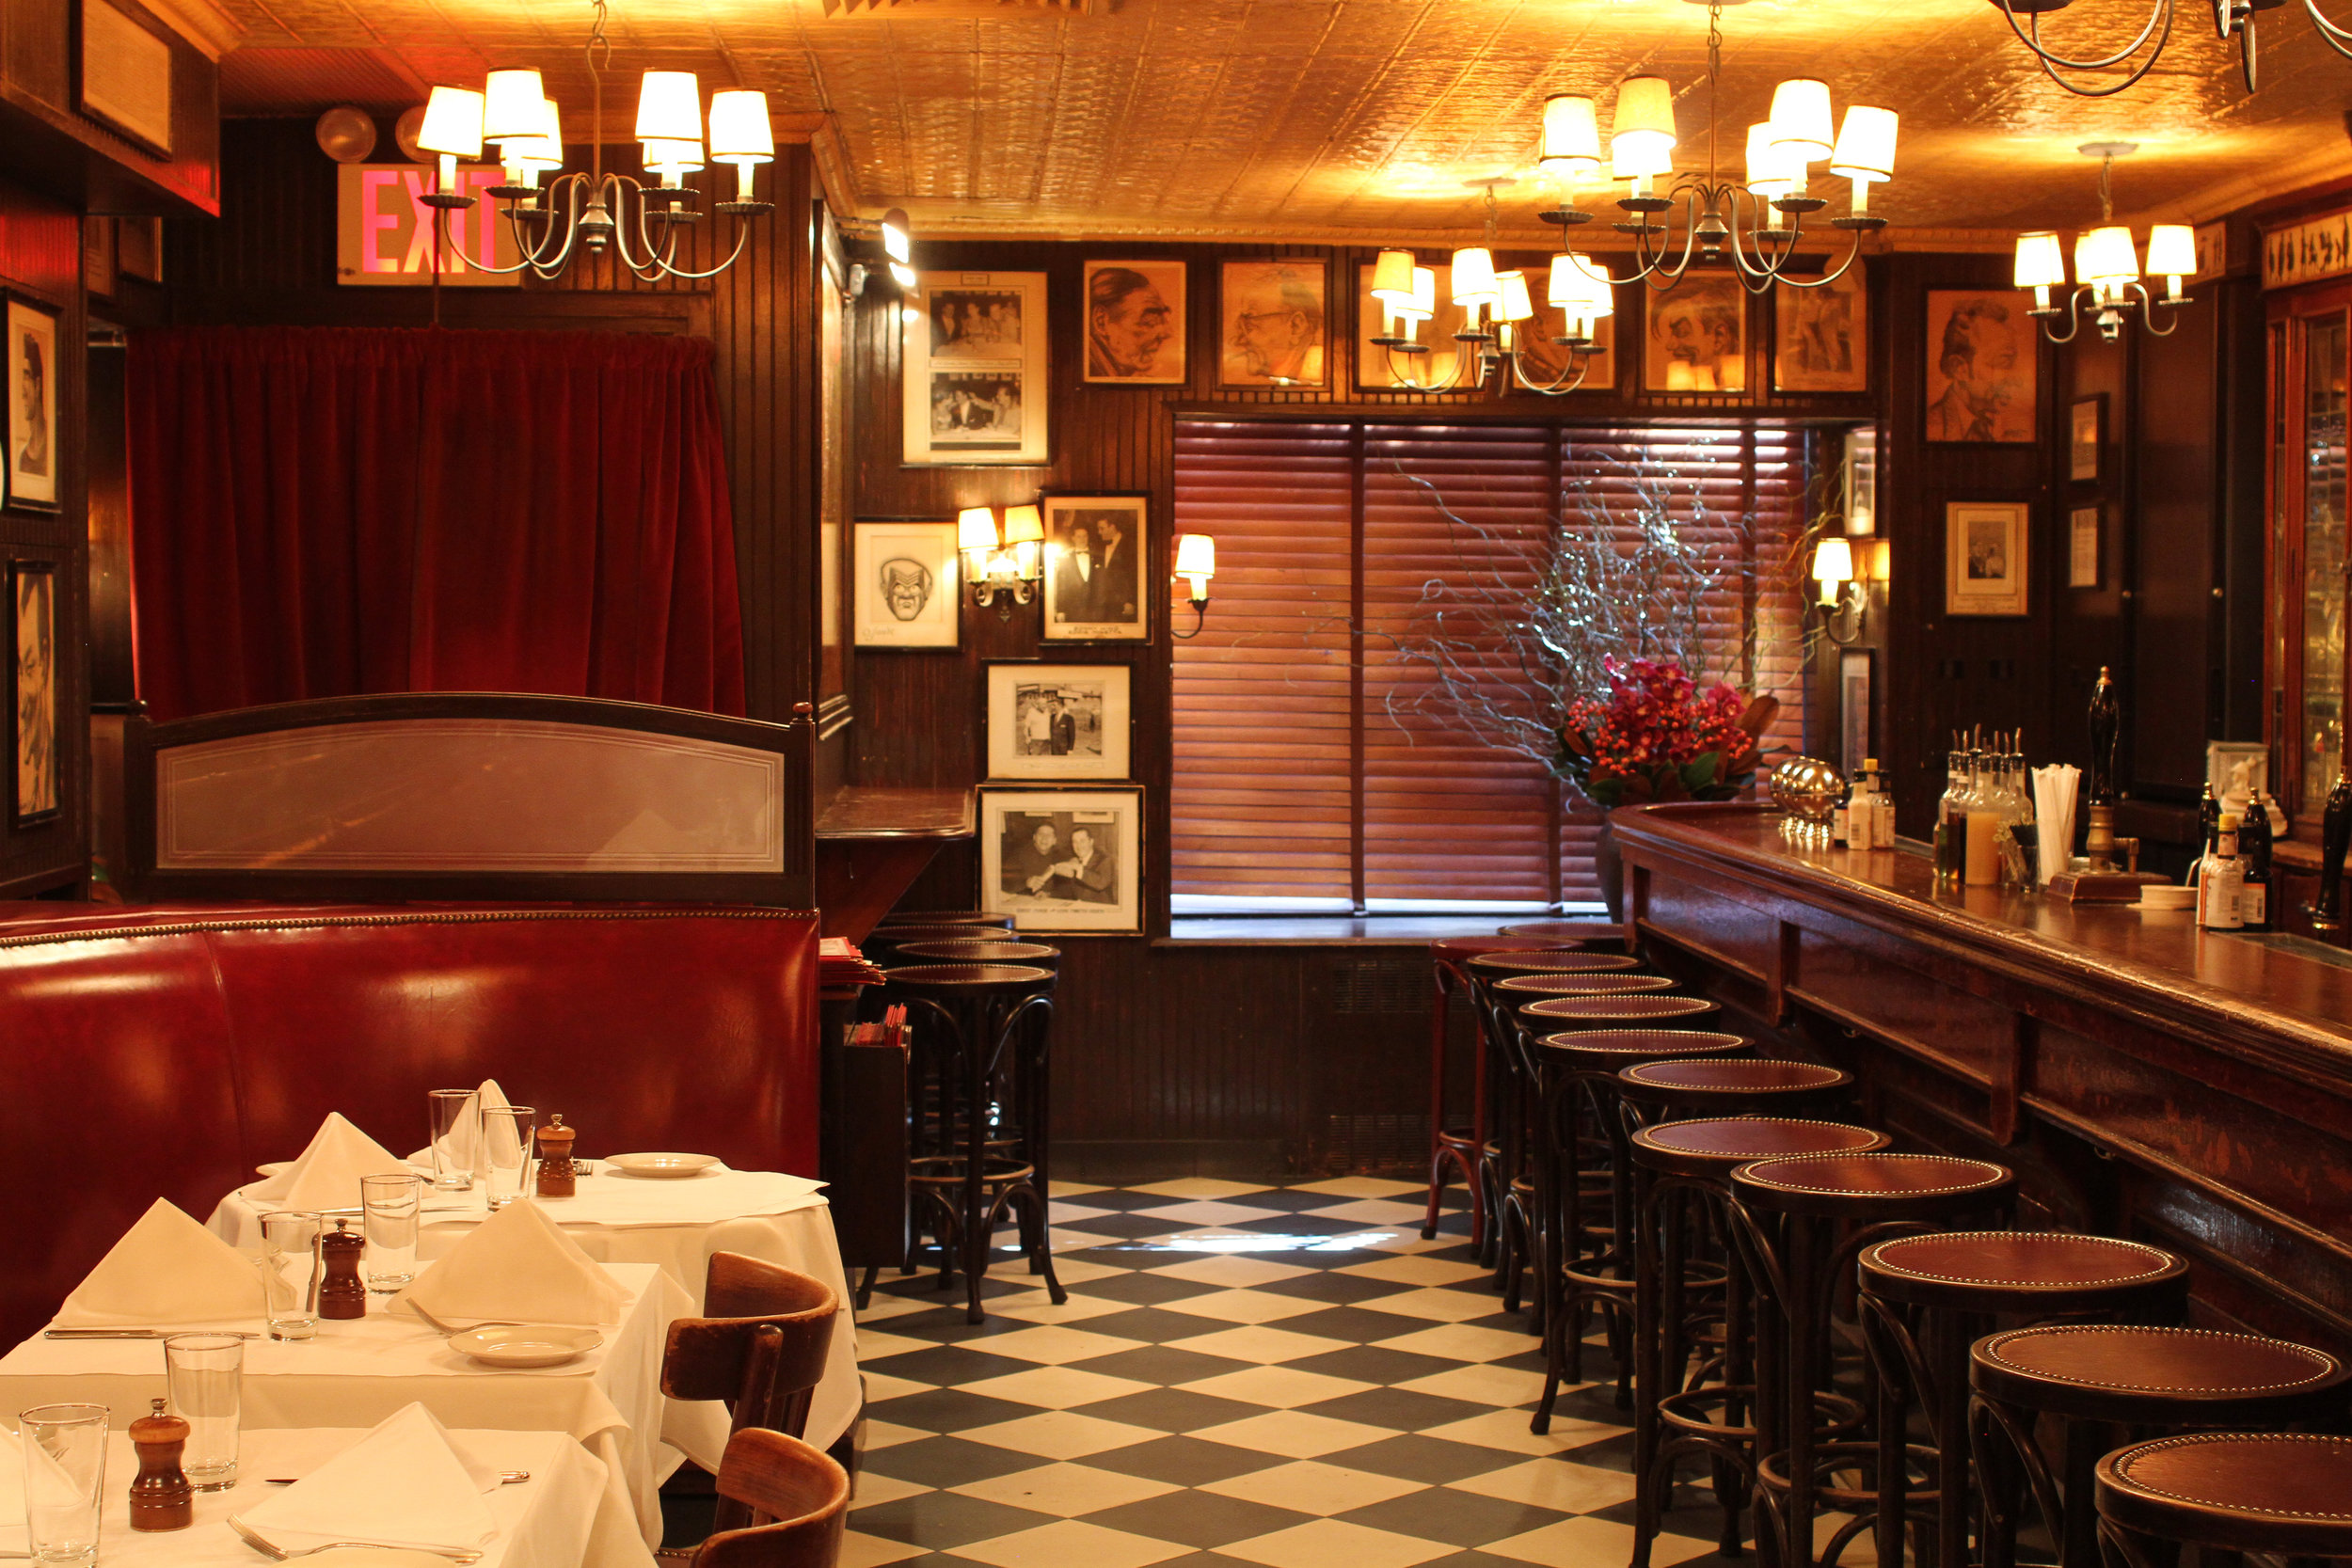 MinettaTavern_Café Banquettes & Bar_Harry McNally_41.jpg